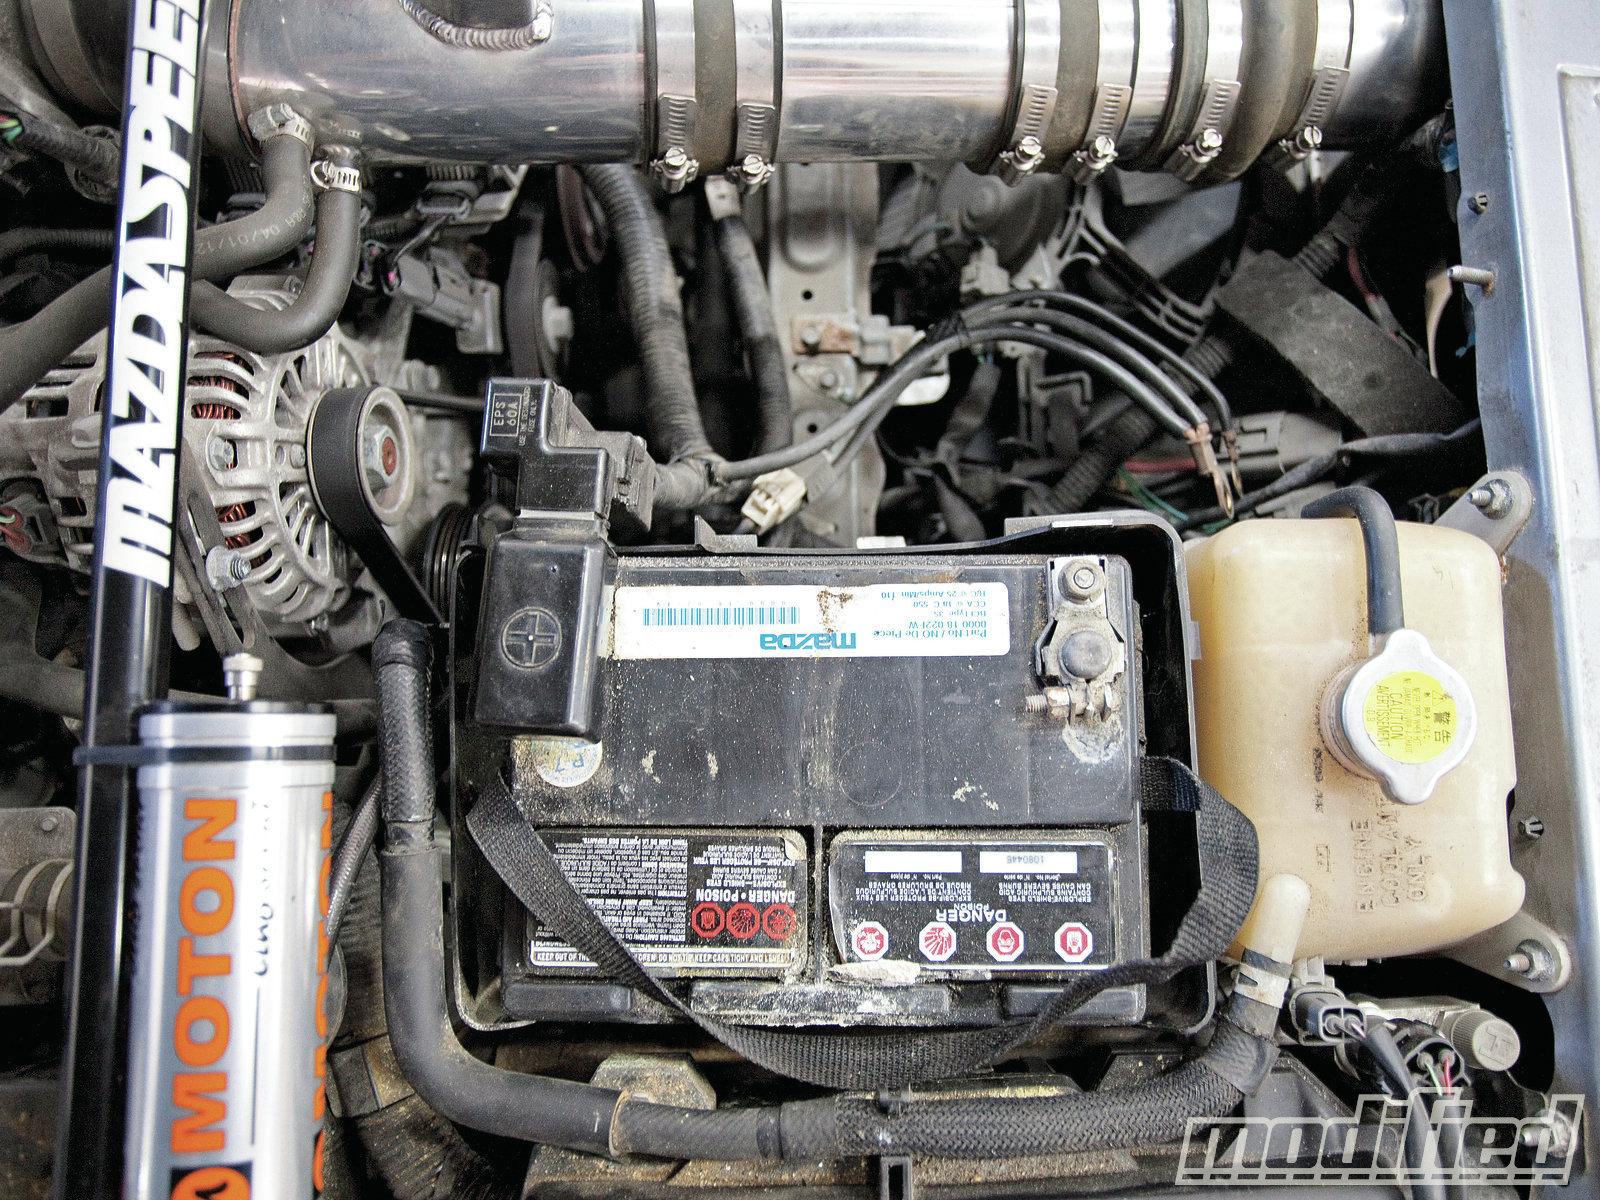 2005 Mazda RX-8 - Quicky Tech - Project RX-8 - Modified Magazine